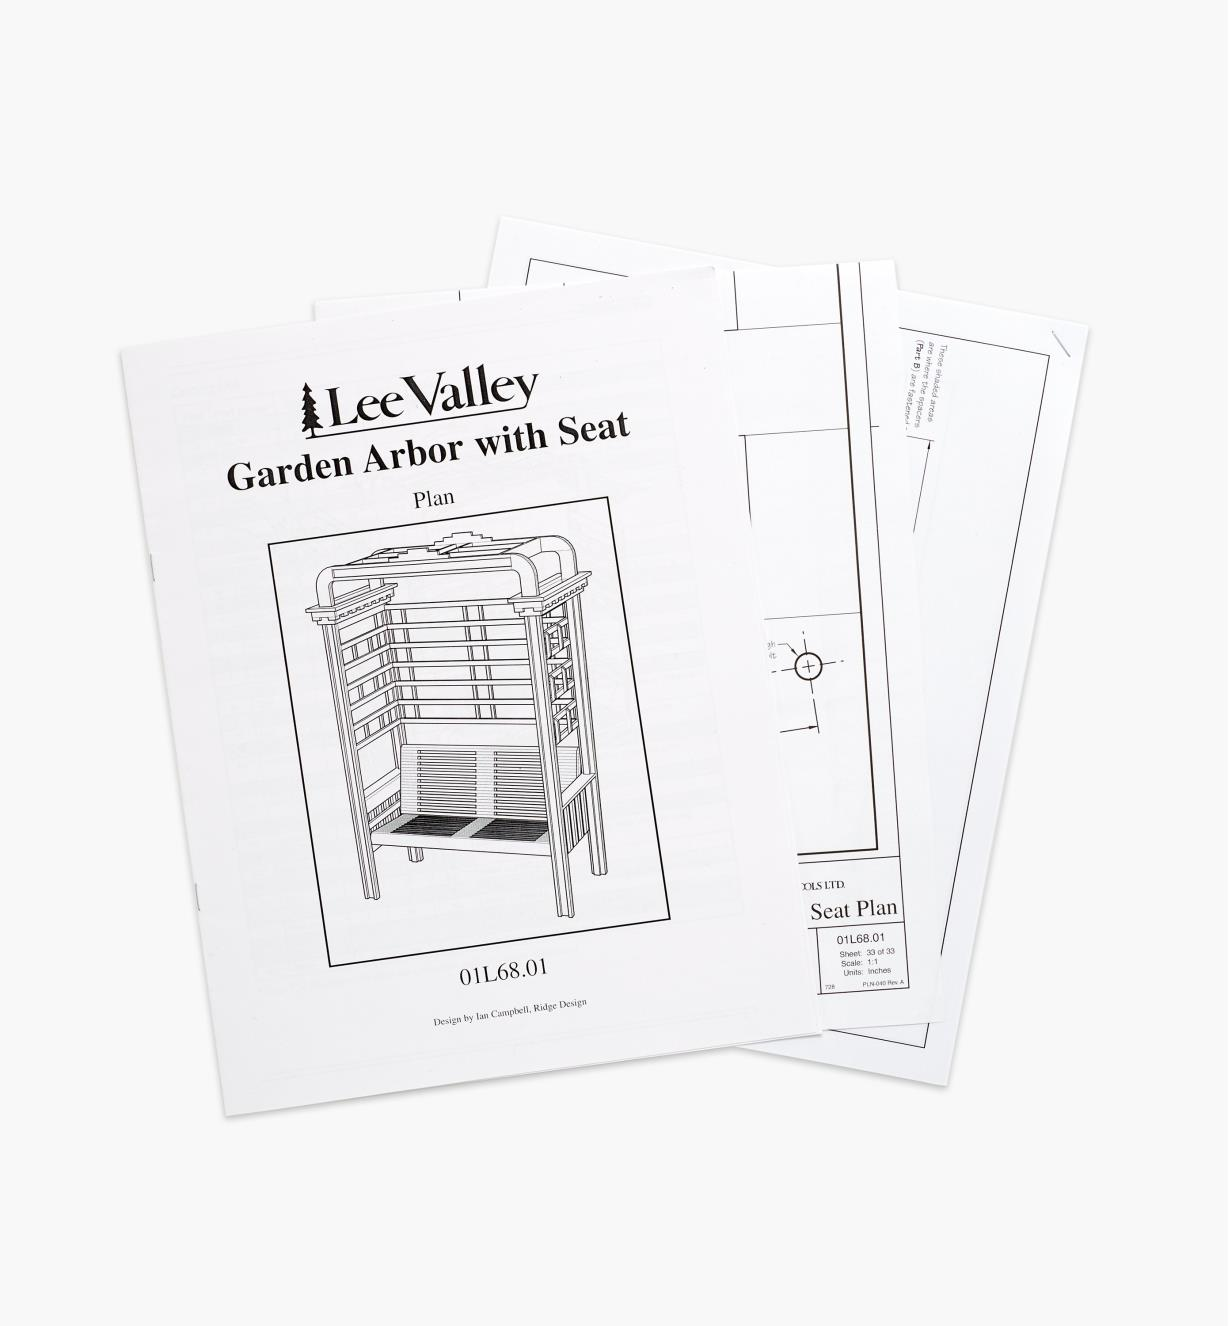 01L6801 - Arbor with Seat Plan